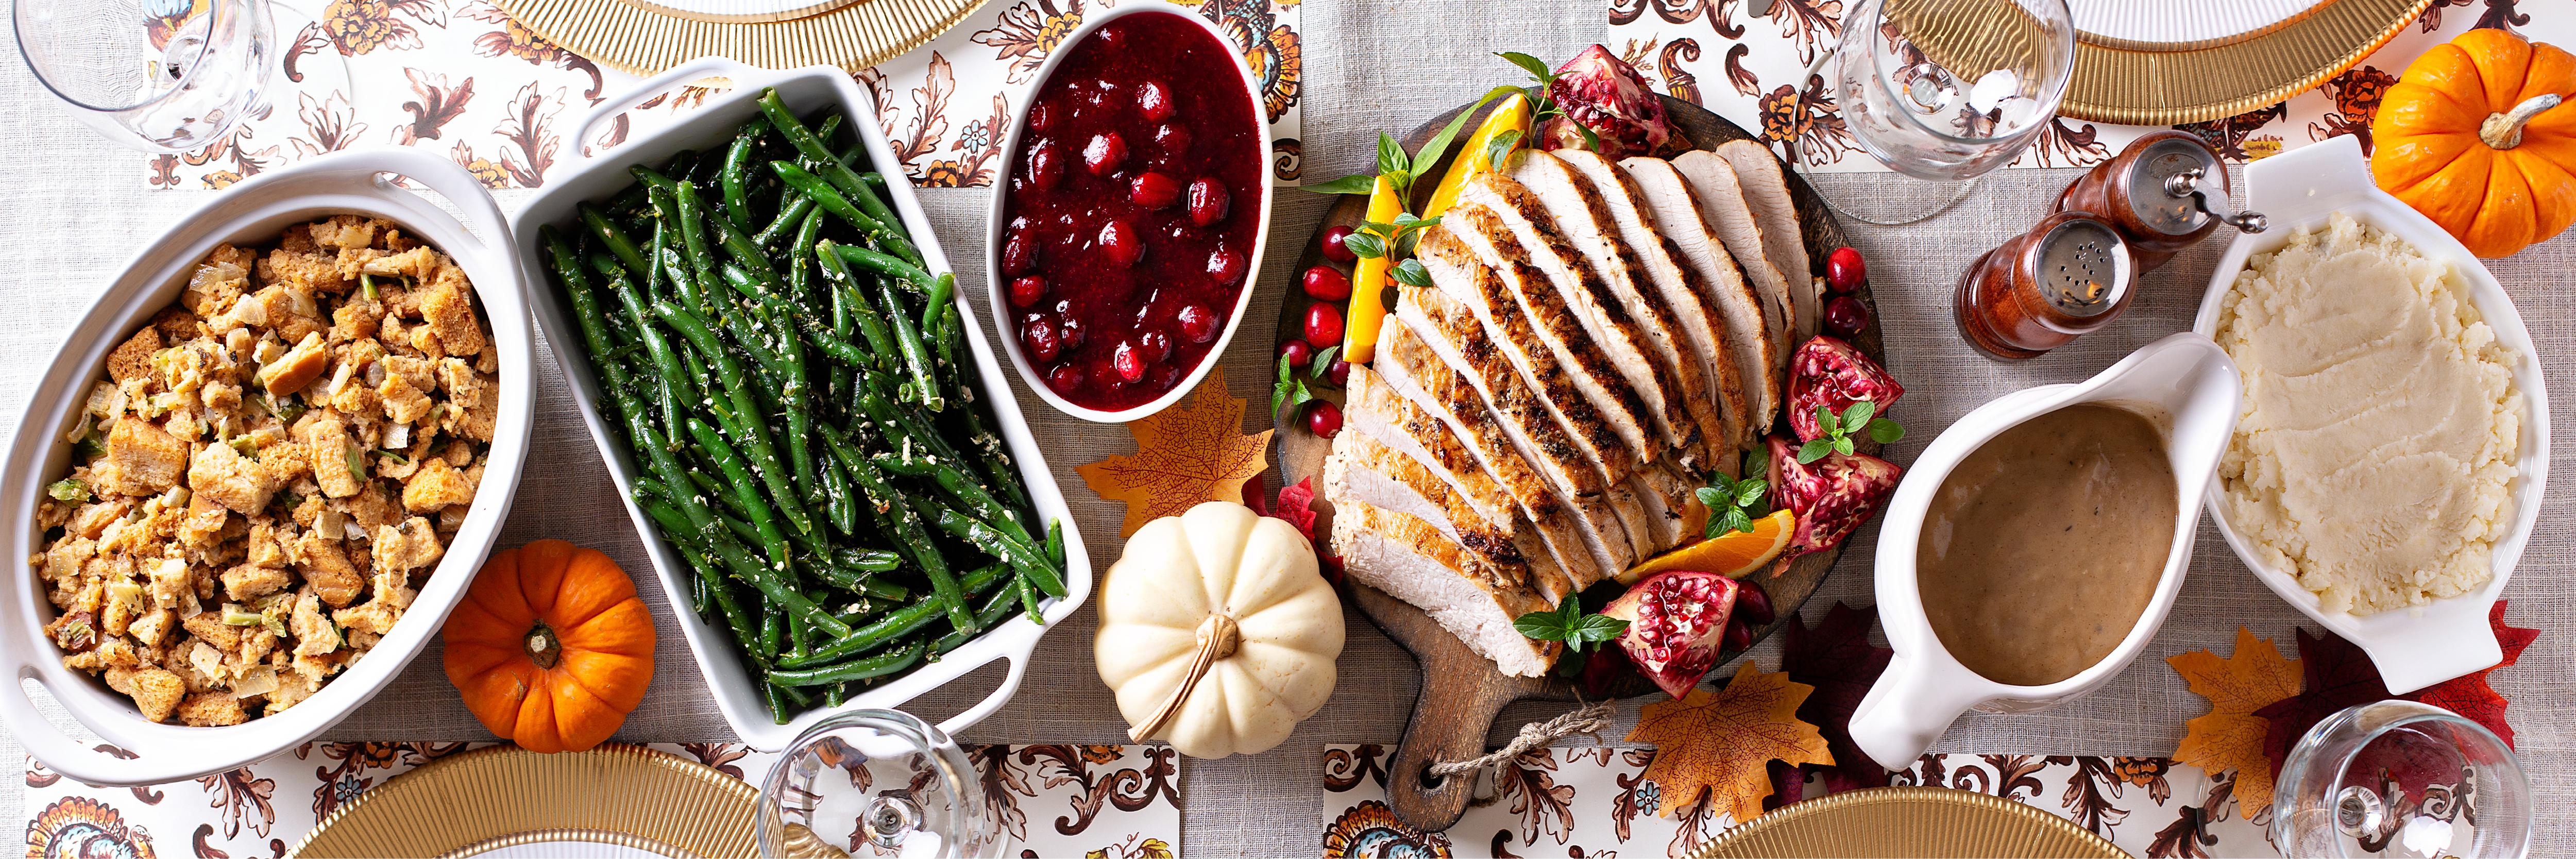 Keeping Thanksgiving Simple